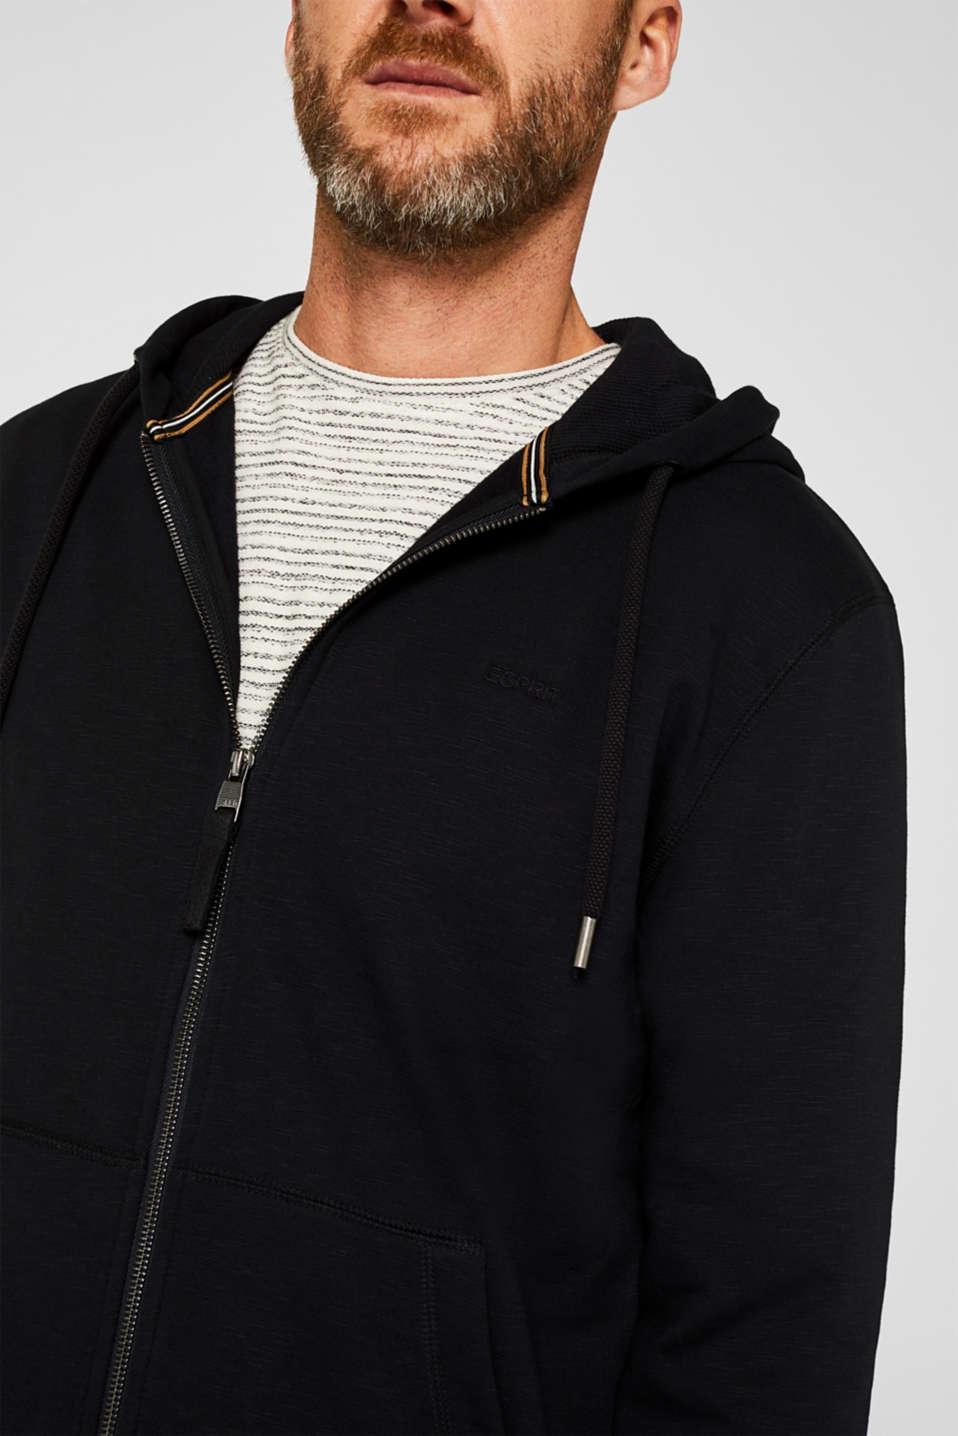 Sweatshirt cardigan with hood, 100% cotton, BLACK, detail image number 2